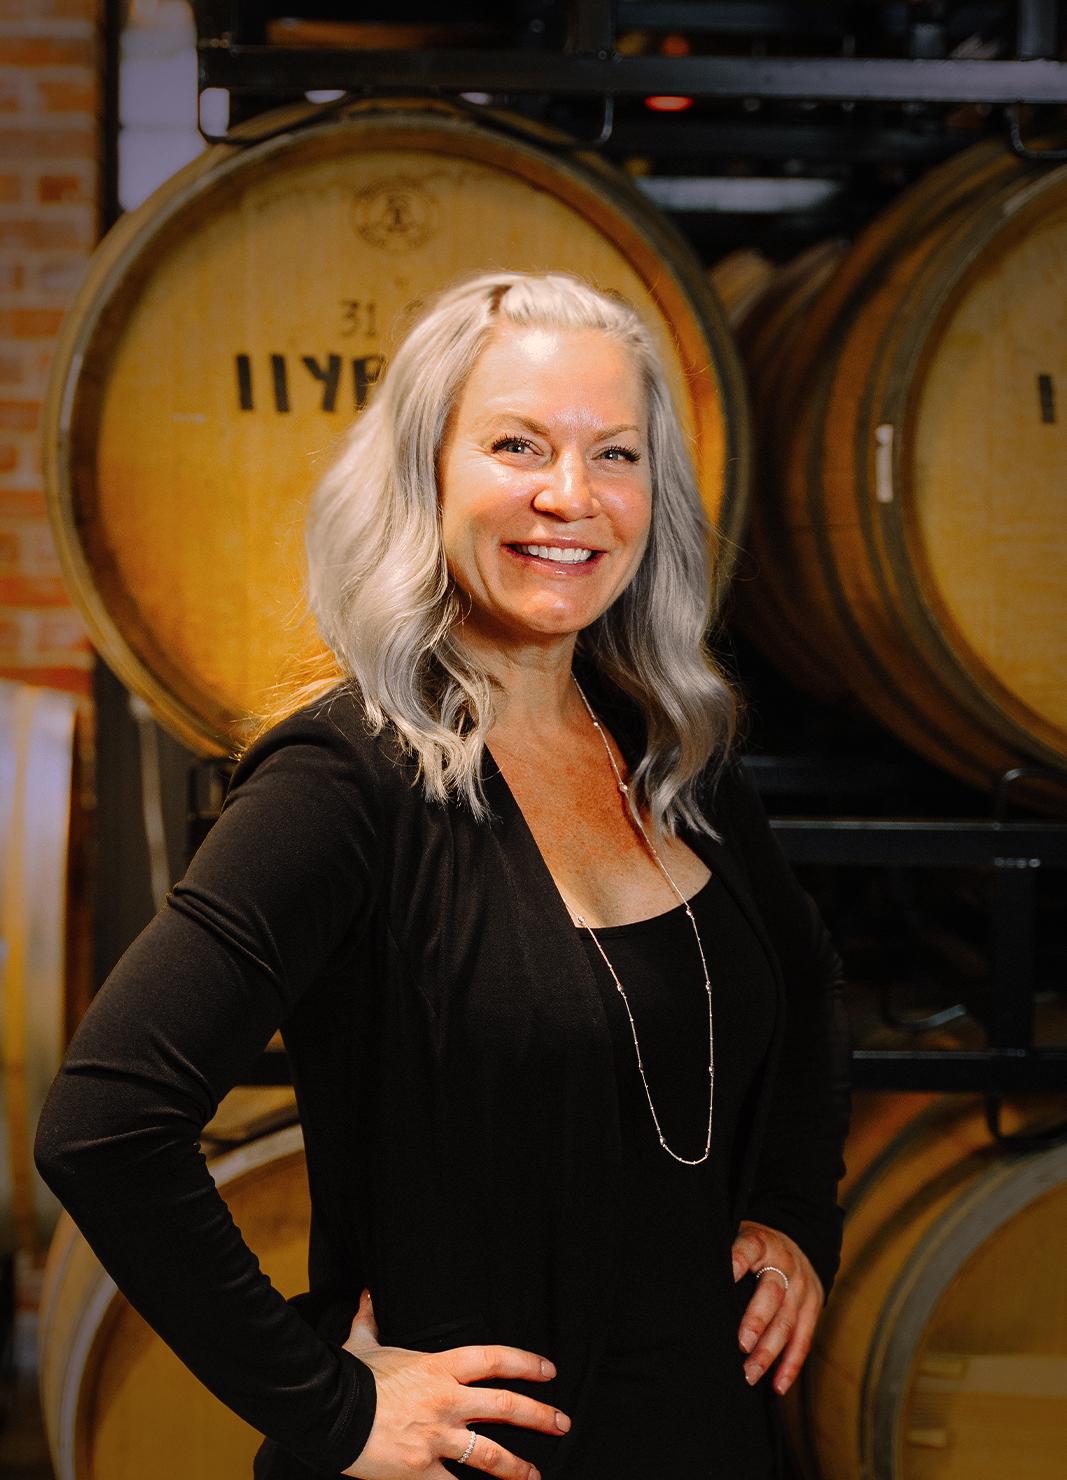 Carboy Tasting Room Manager, Cindy Davis, standing in front of wine barrels